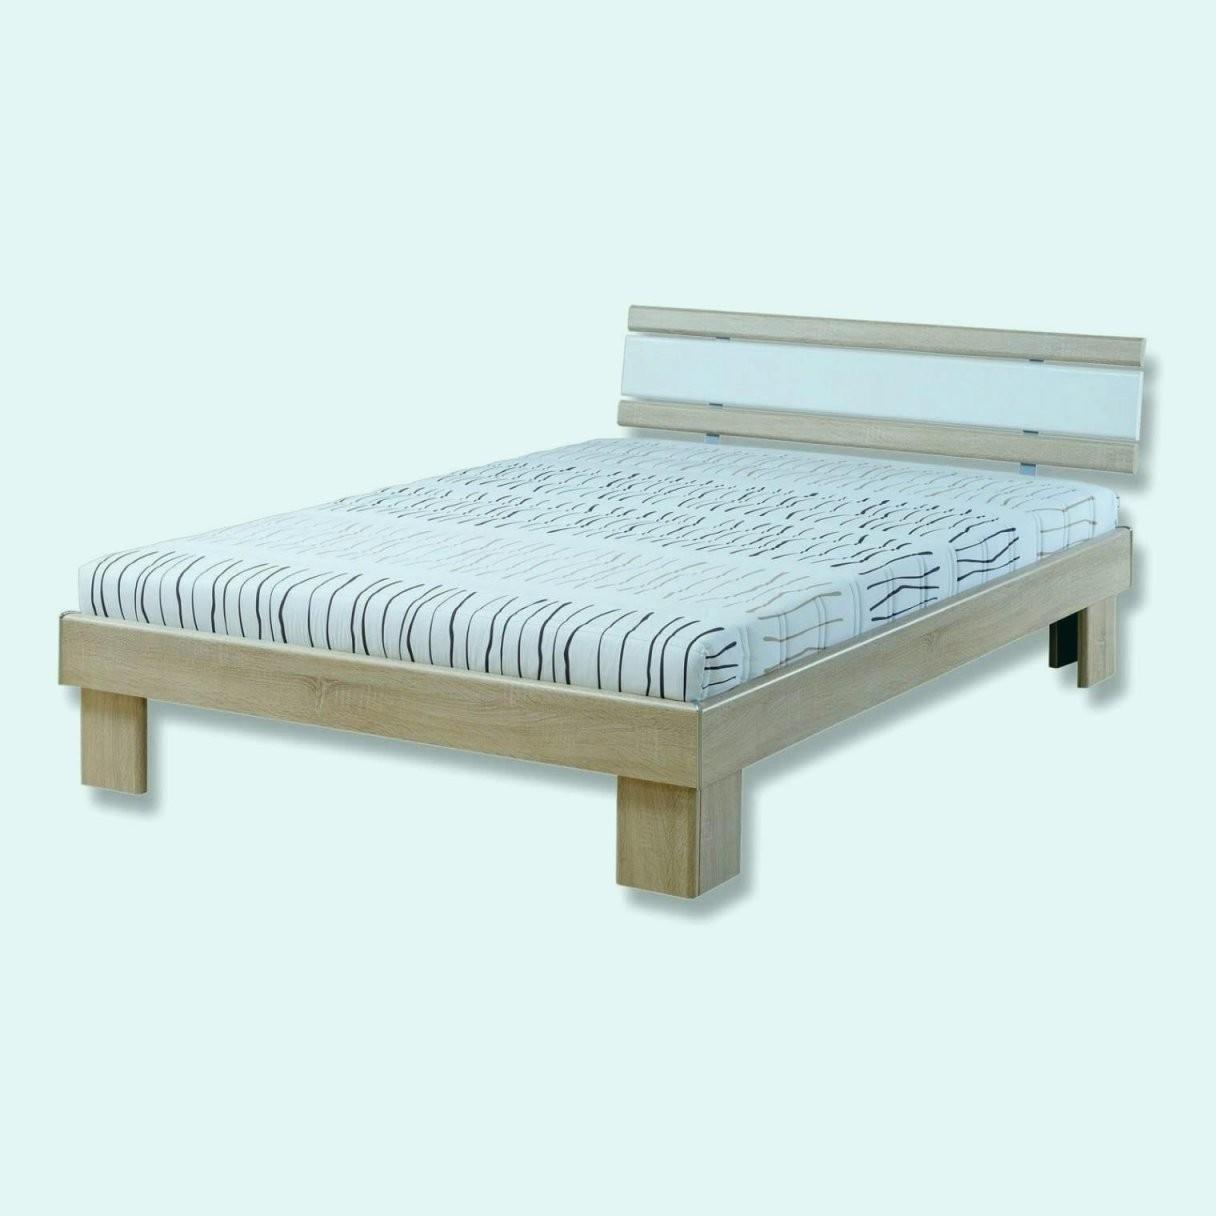 Bett 100×200 Poco Perfekt Lattenroste 100×200 Bibi Blocksberg von Bettwäsche Bibi Blocksberg Bild